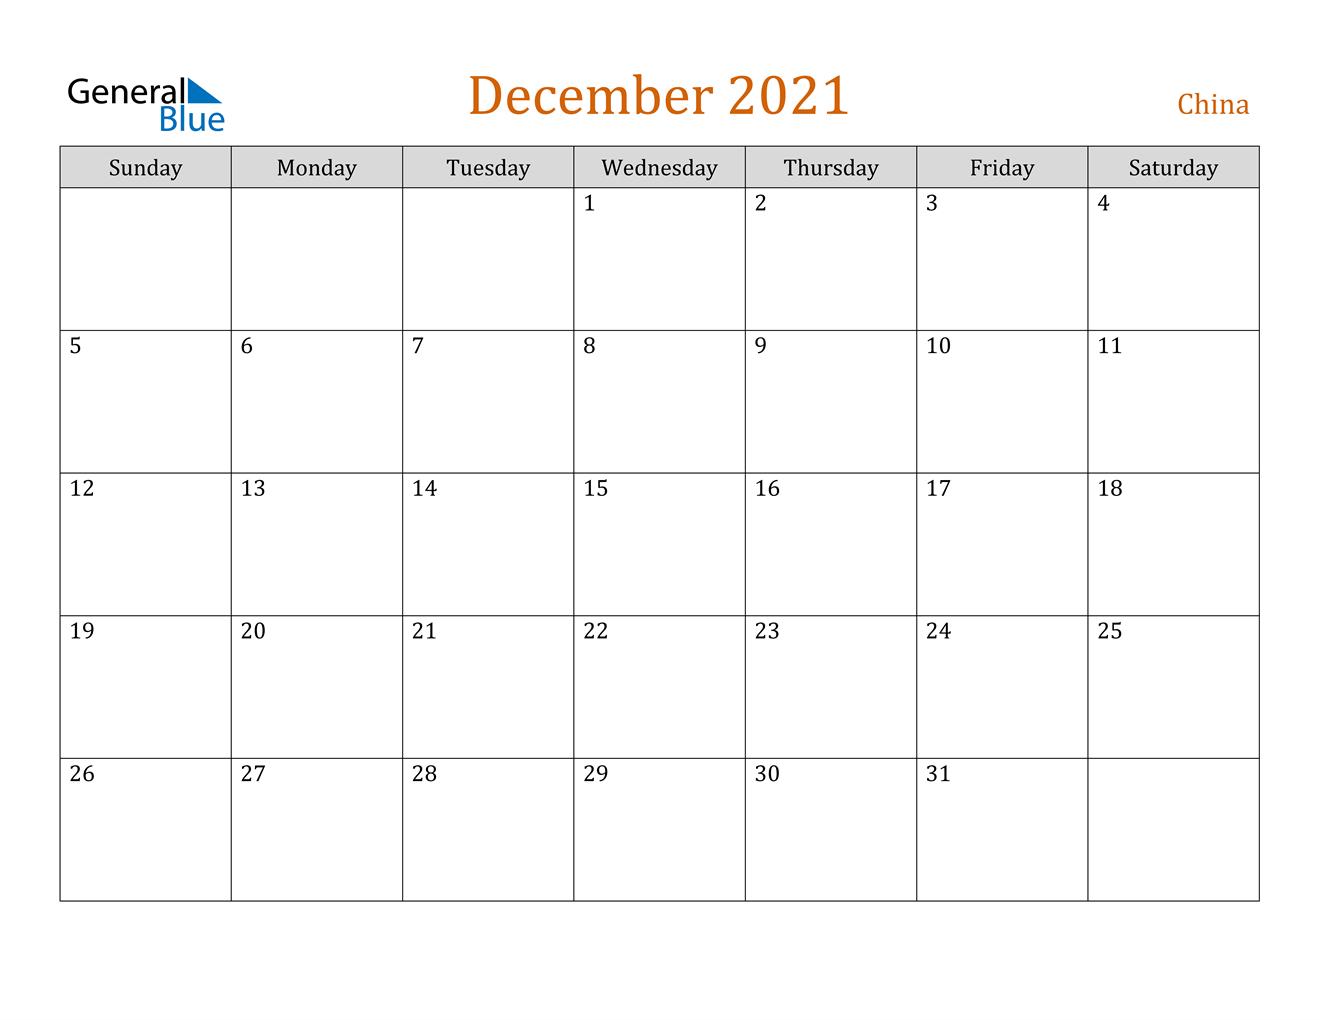 China December 2021 Calendar With Holidays